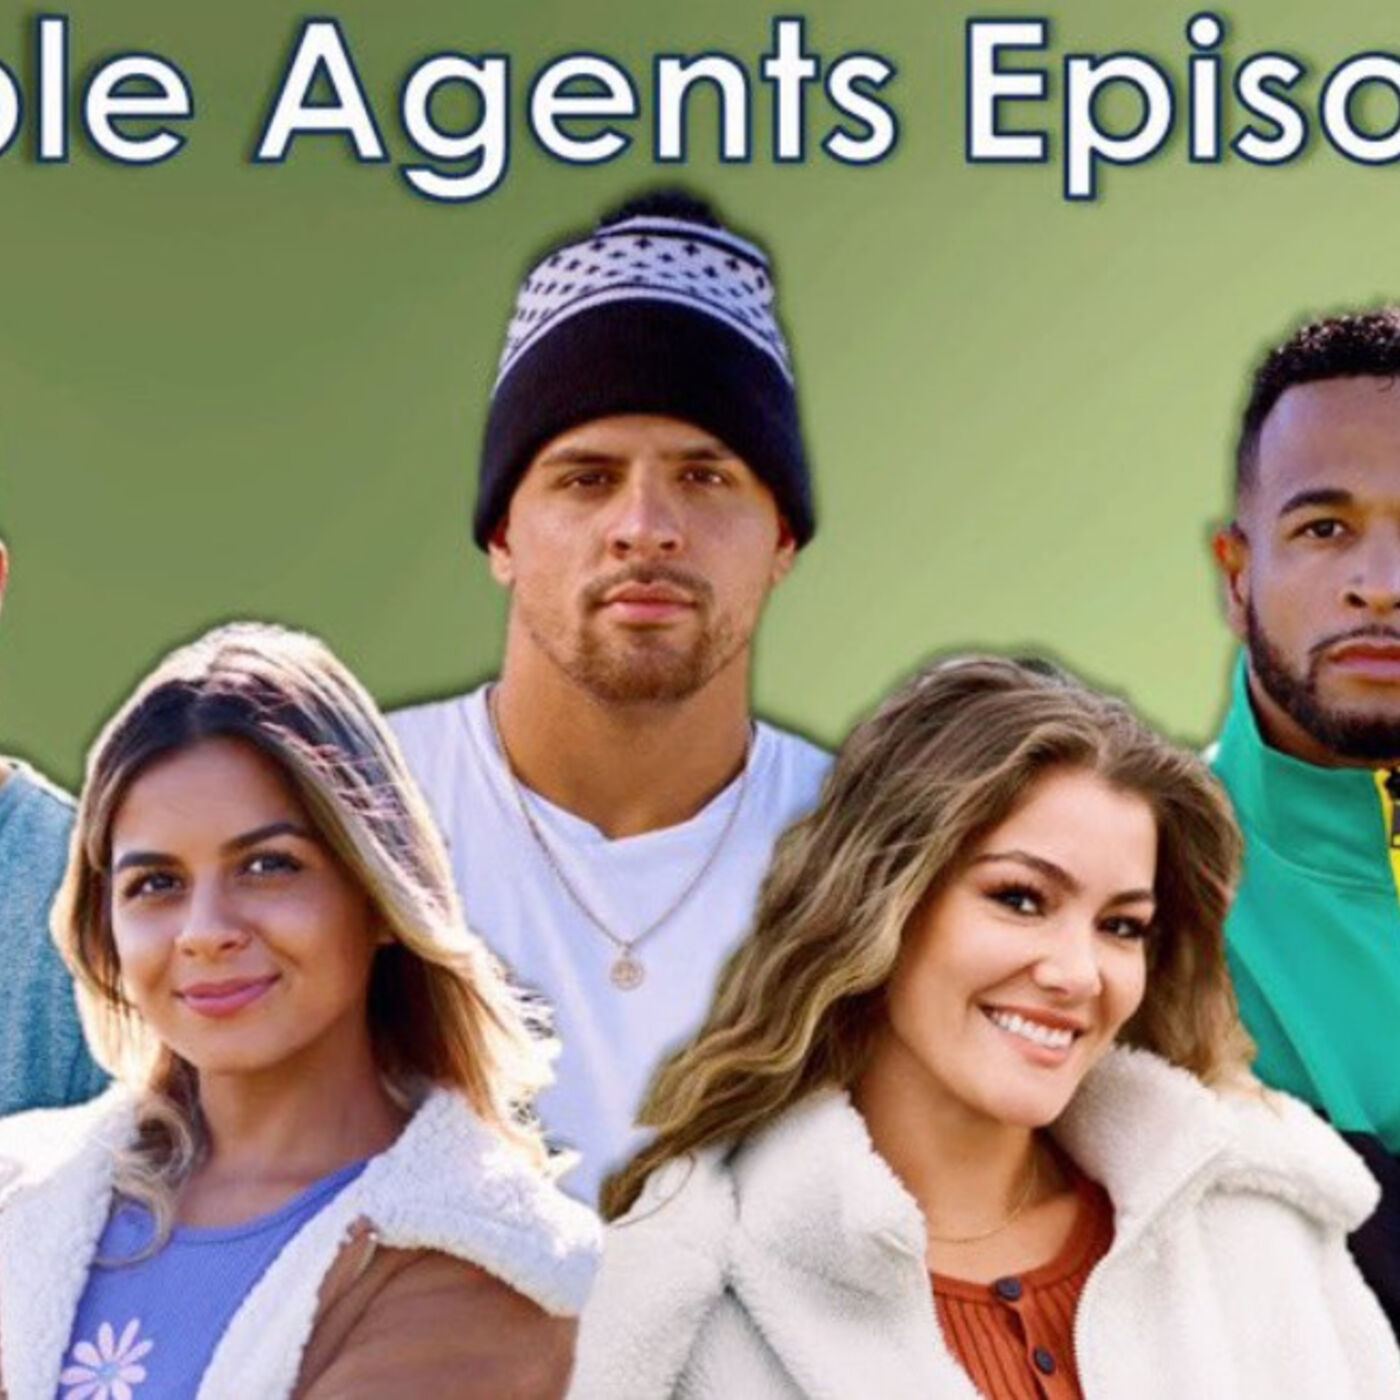 Challenge Double Agents Episode 4 Recap: Flirty Fessy's Messy Ride